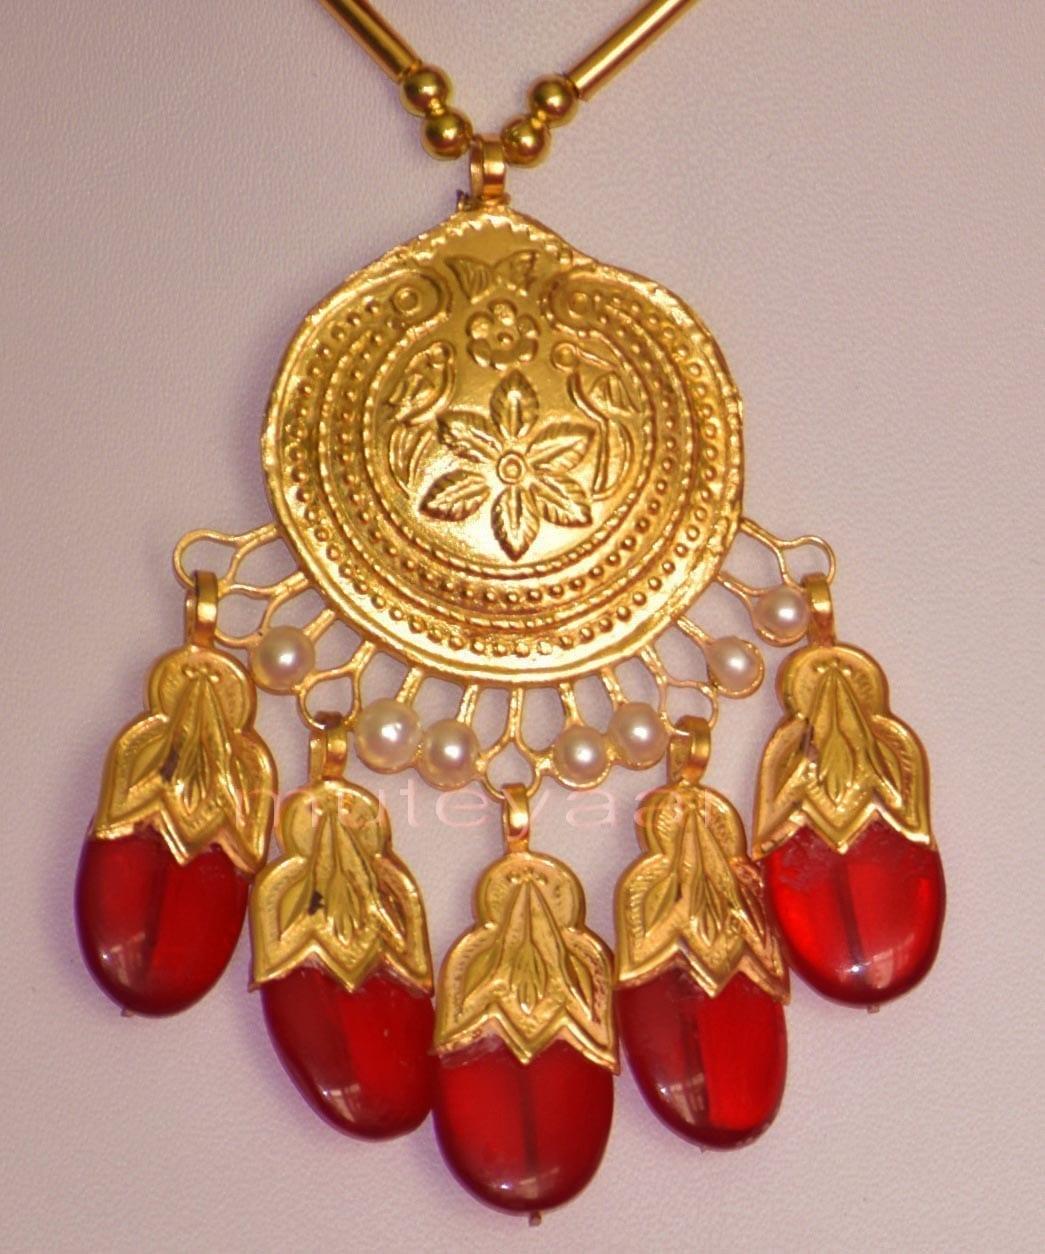 24 Ct. Gold Plated Traditional Punjabi Full Dakh Set jewellery with Tikka  J0209 3